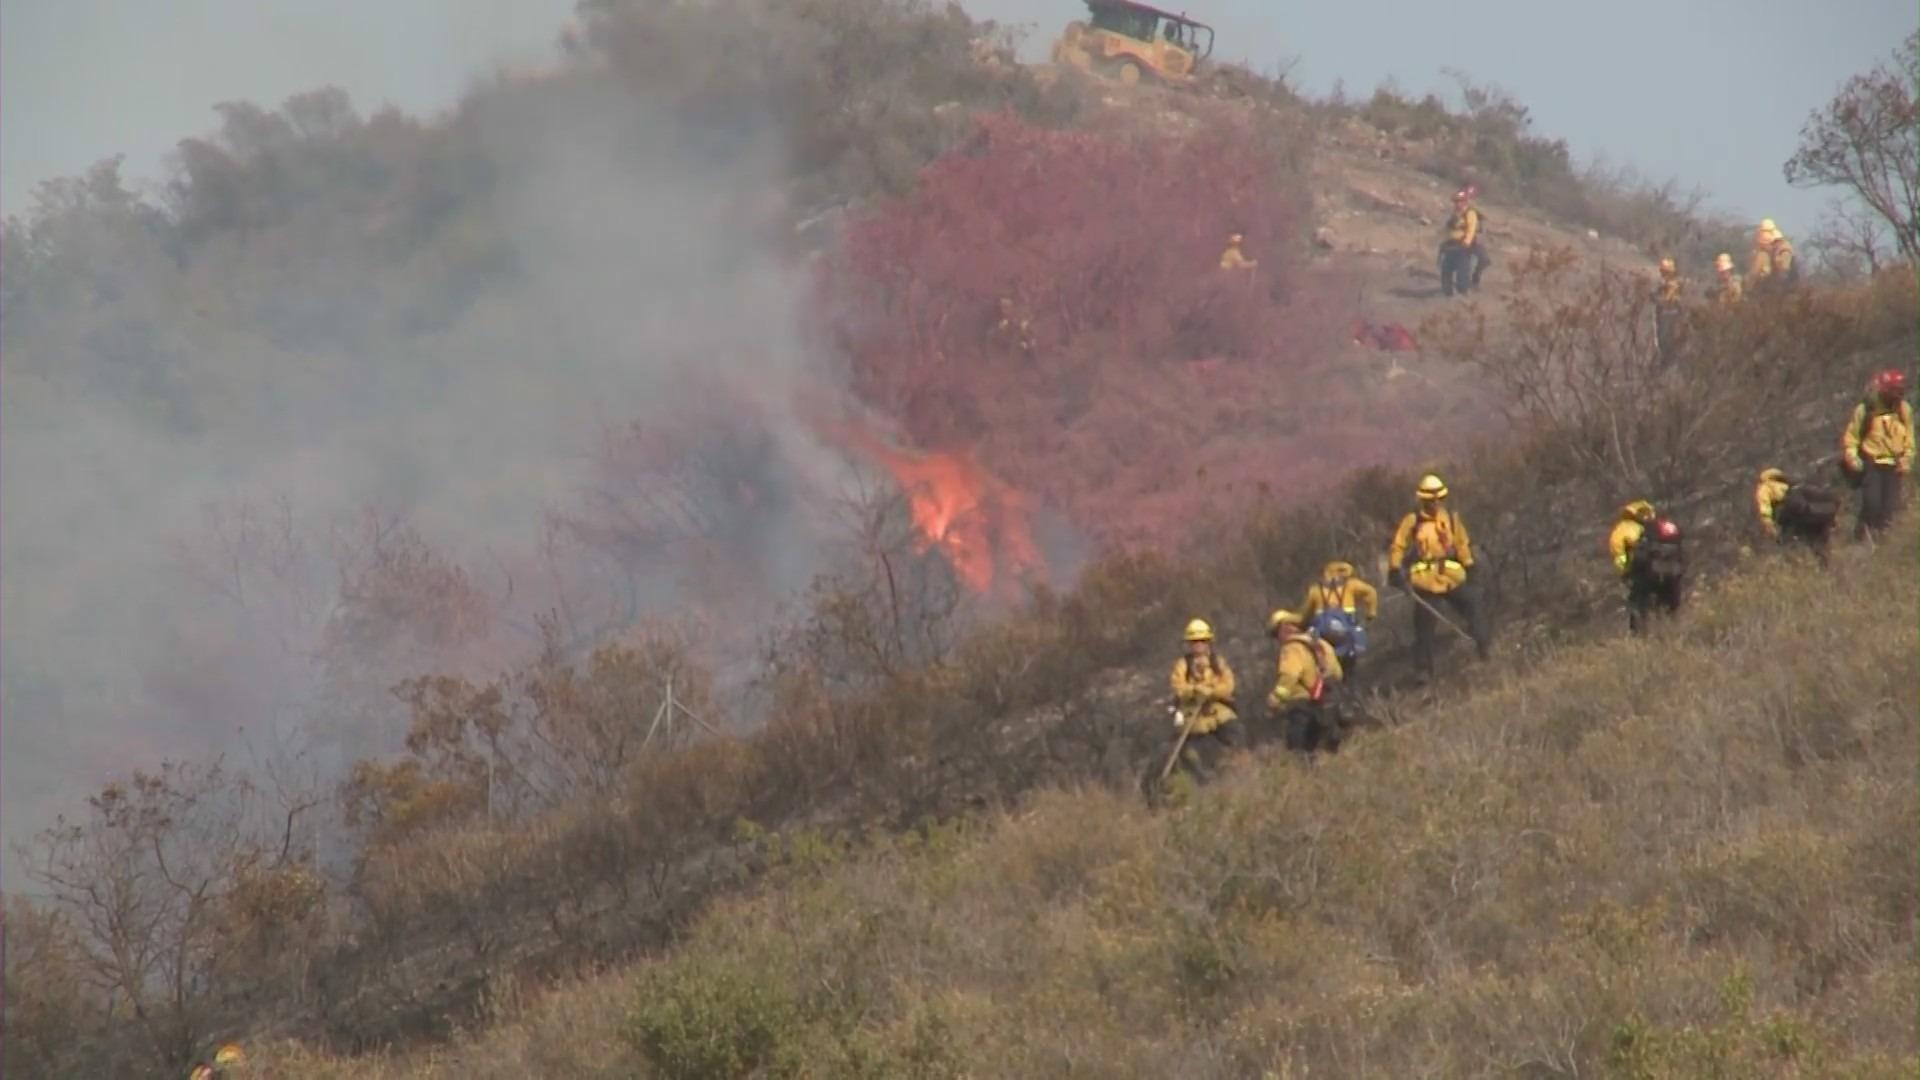 A small brush fire burns along the 73 Freeway in Laguna Beach on June 16, 2021. (KTLA)